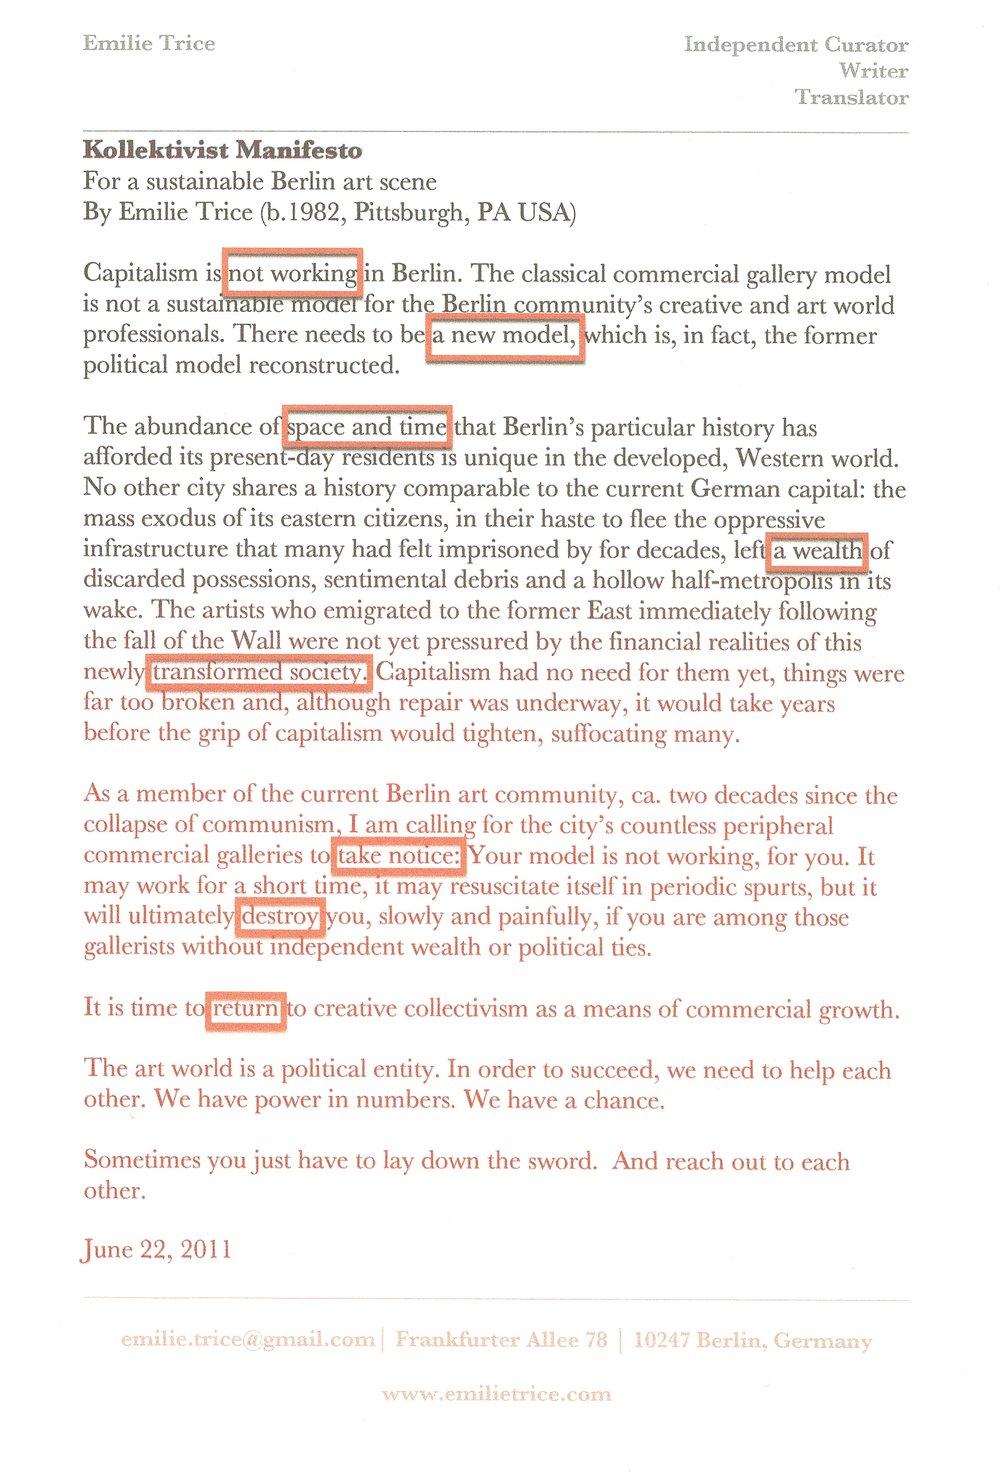 Unfinished business manifesto emilie trice portfolio unfinished business manifesto reheart Gallery